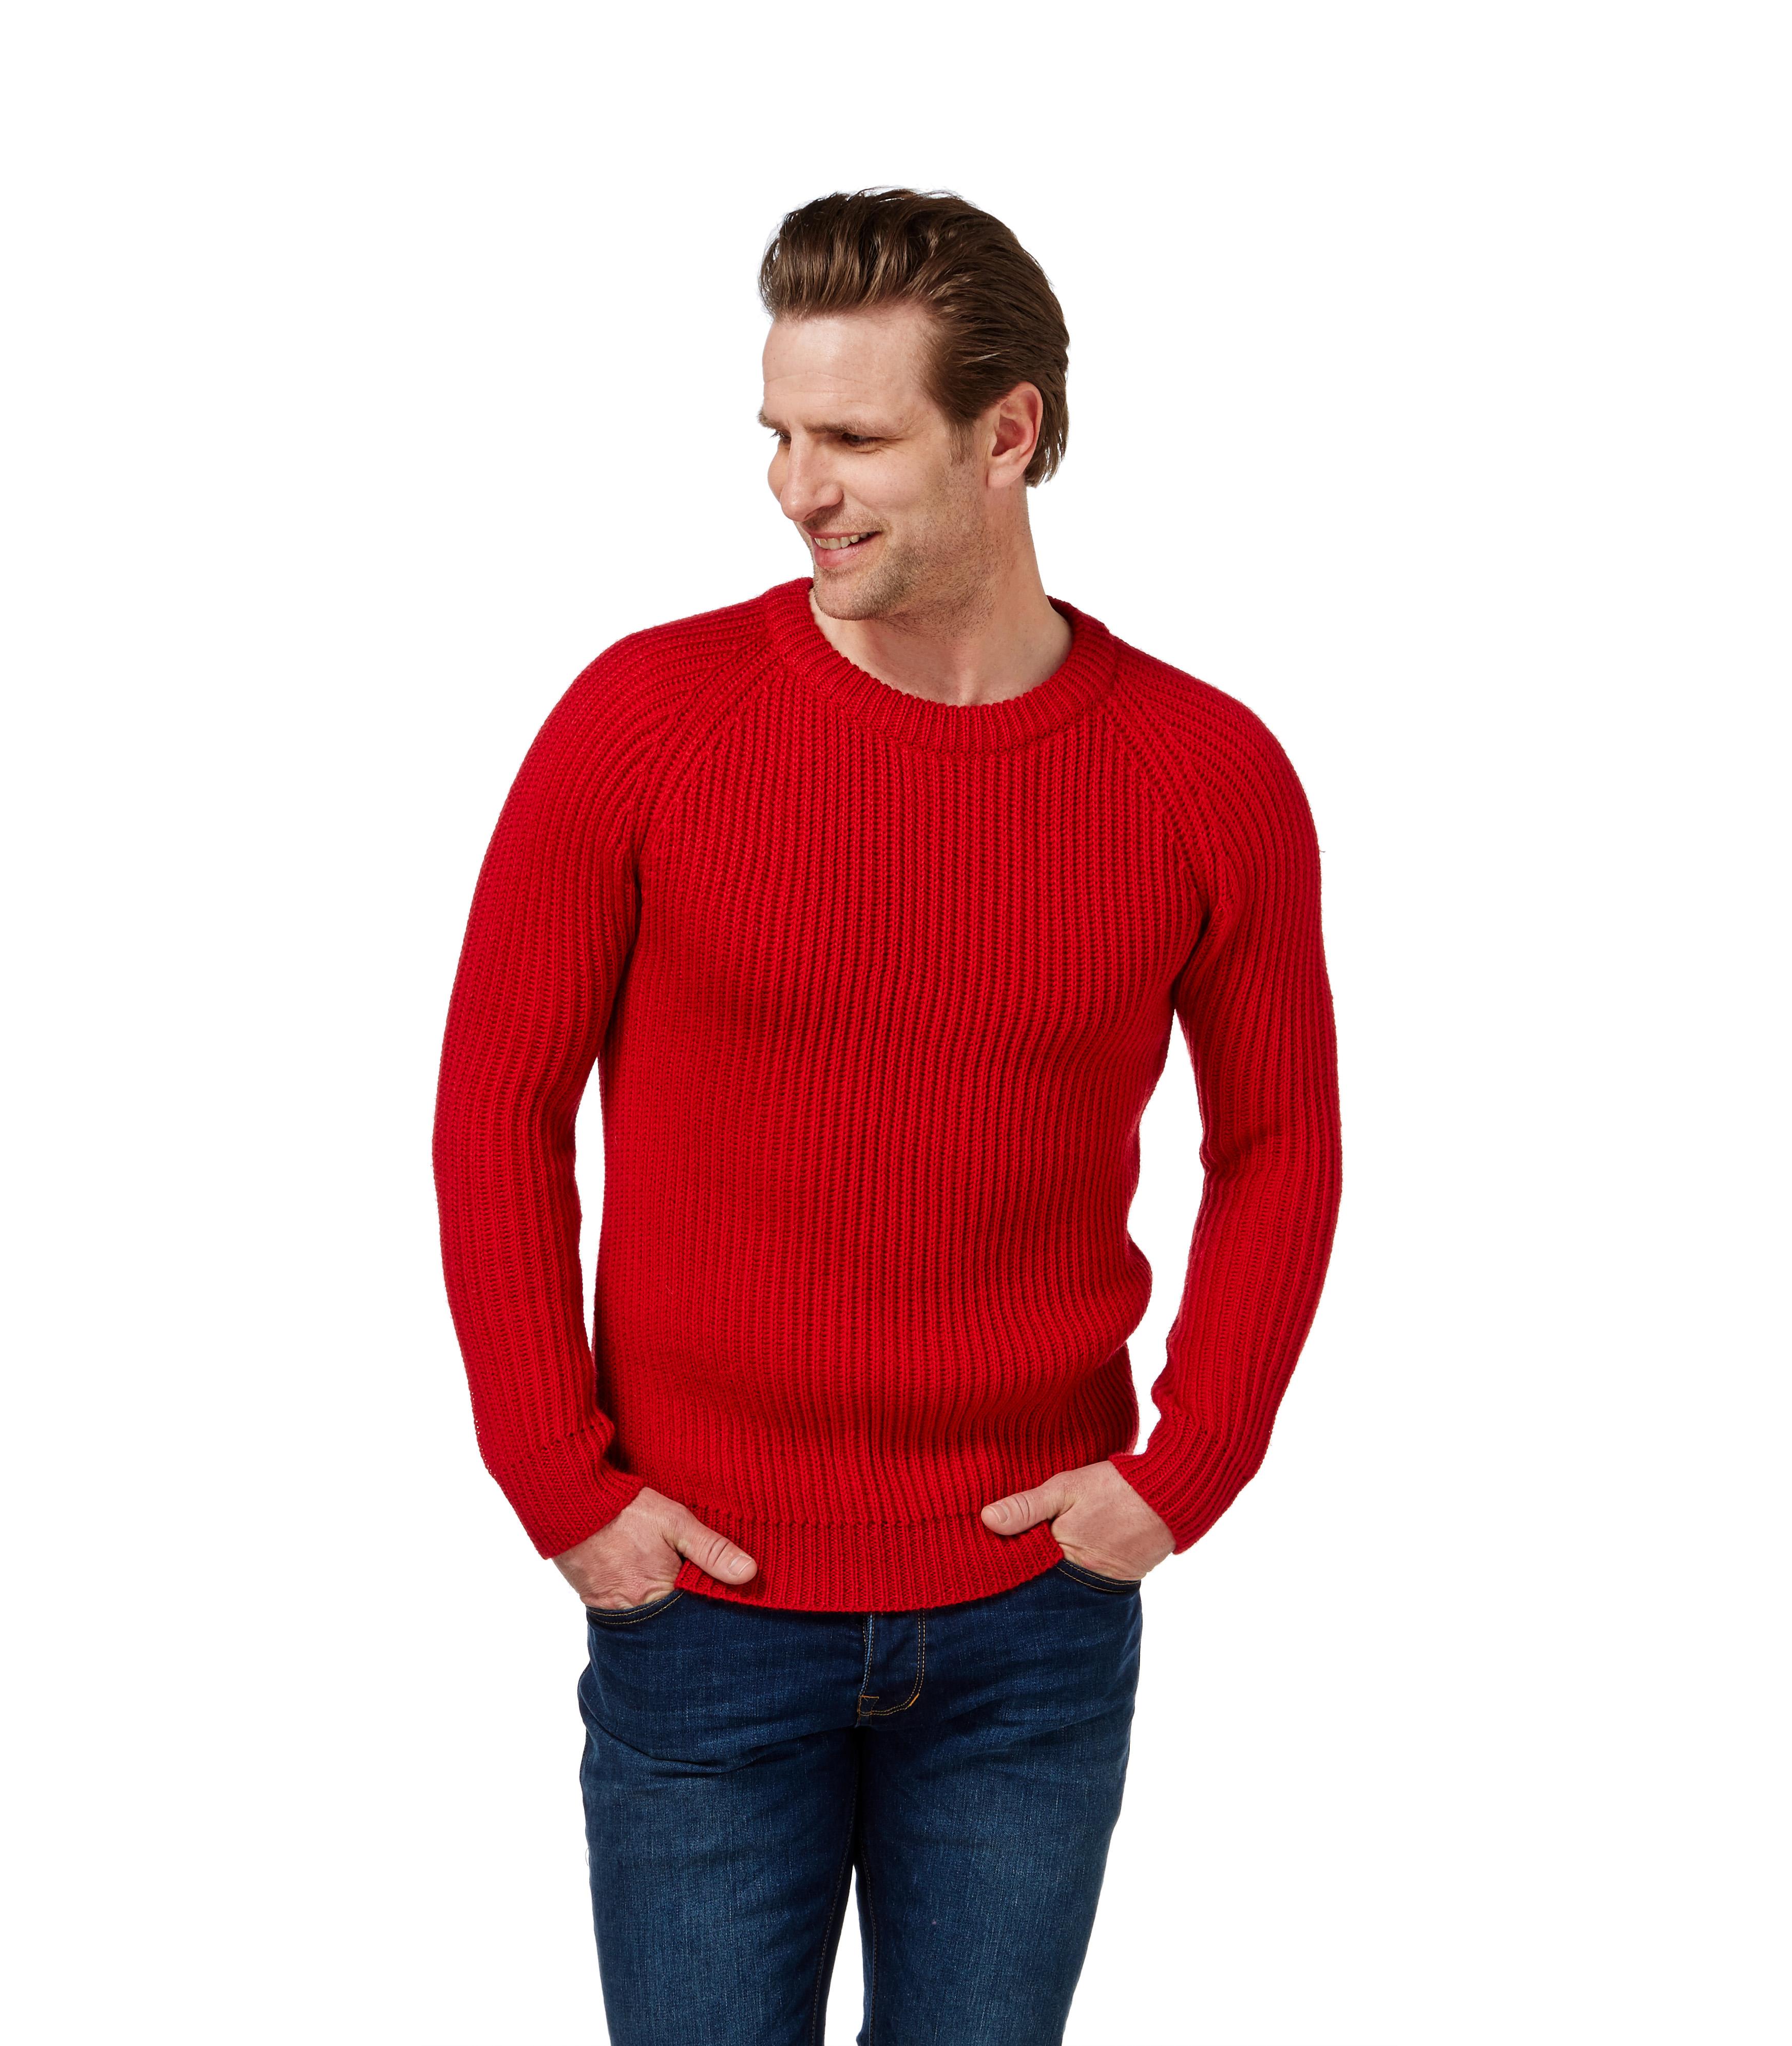 Hemisphere Mens Clothing